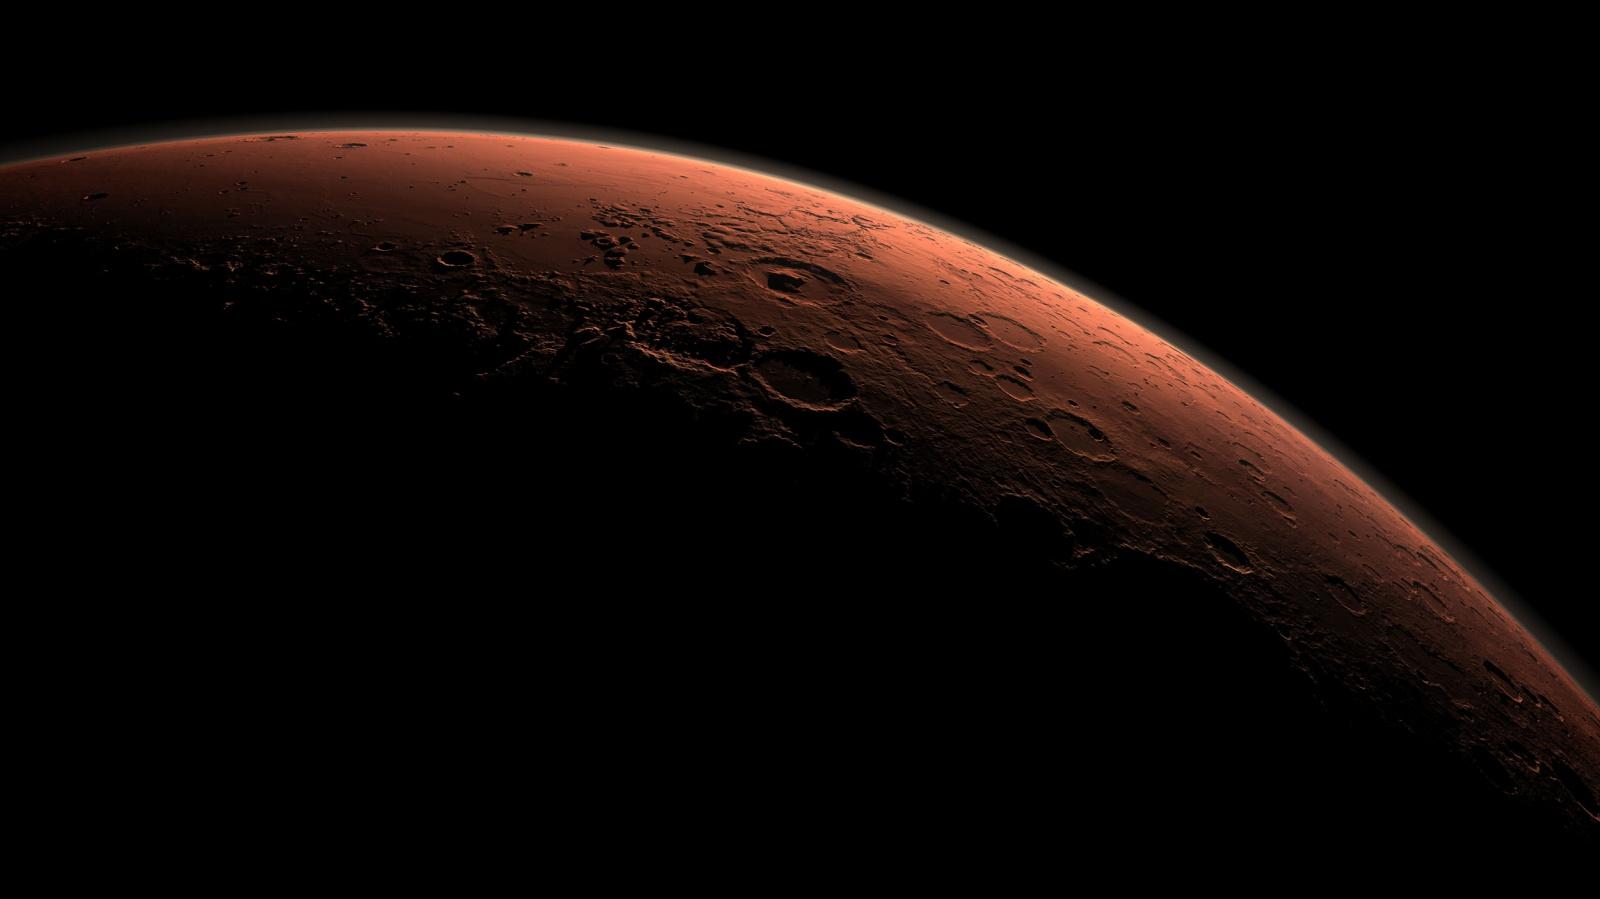 НАСА начинает эксперимент по изоляции для симуляции полёта на Марс - 1